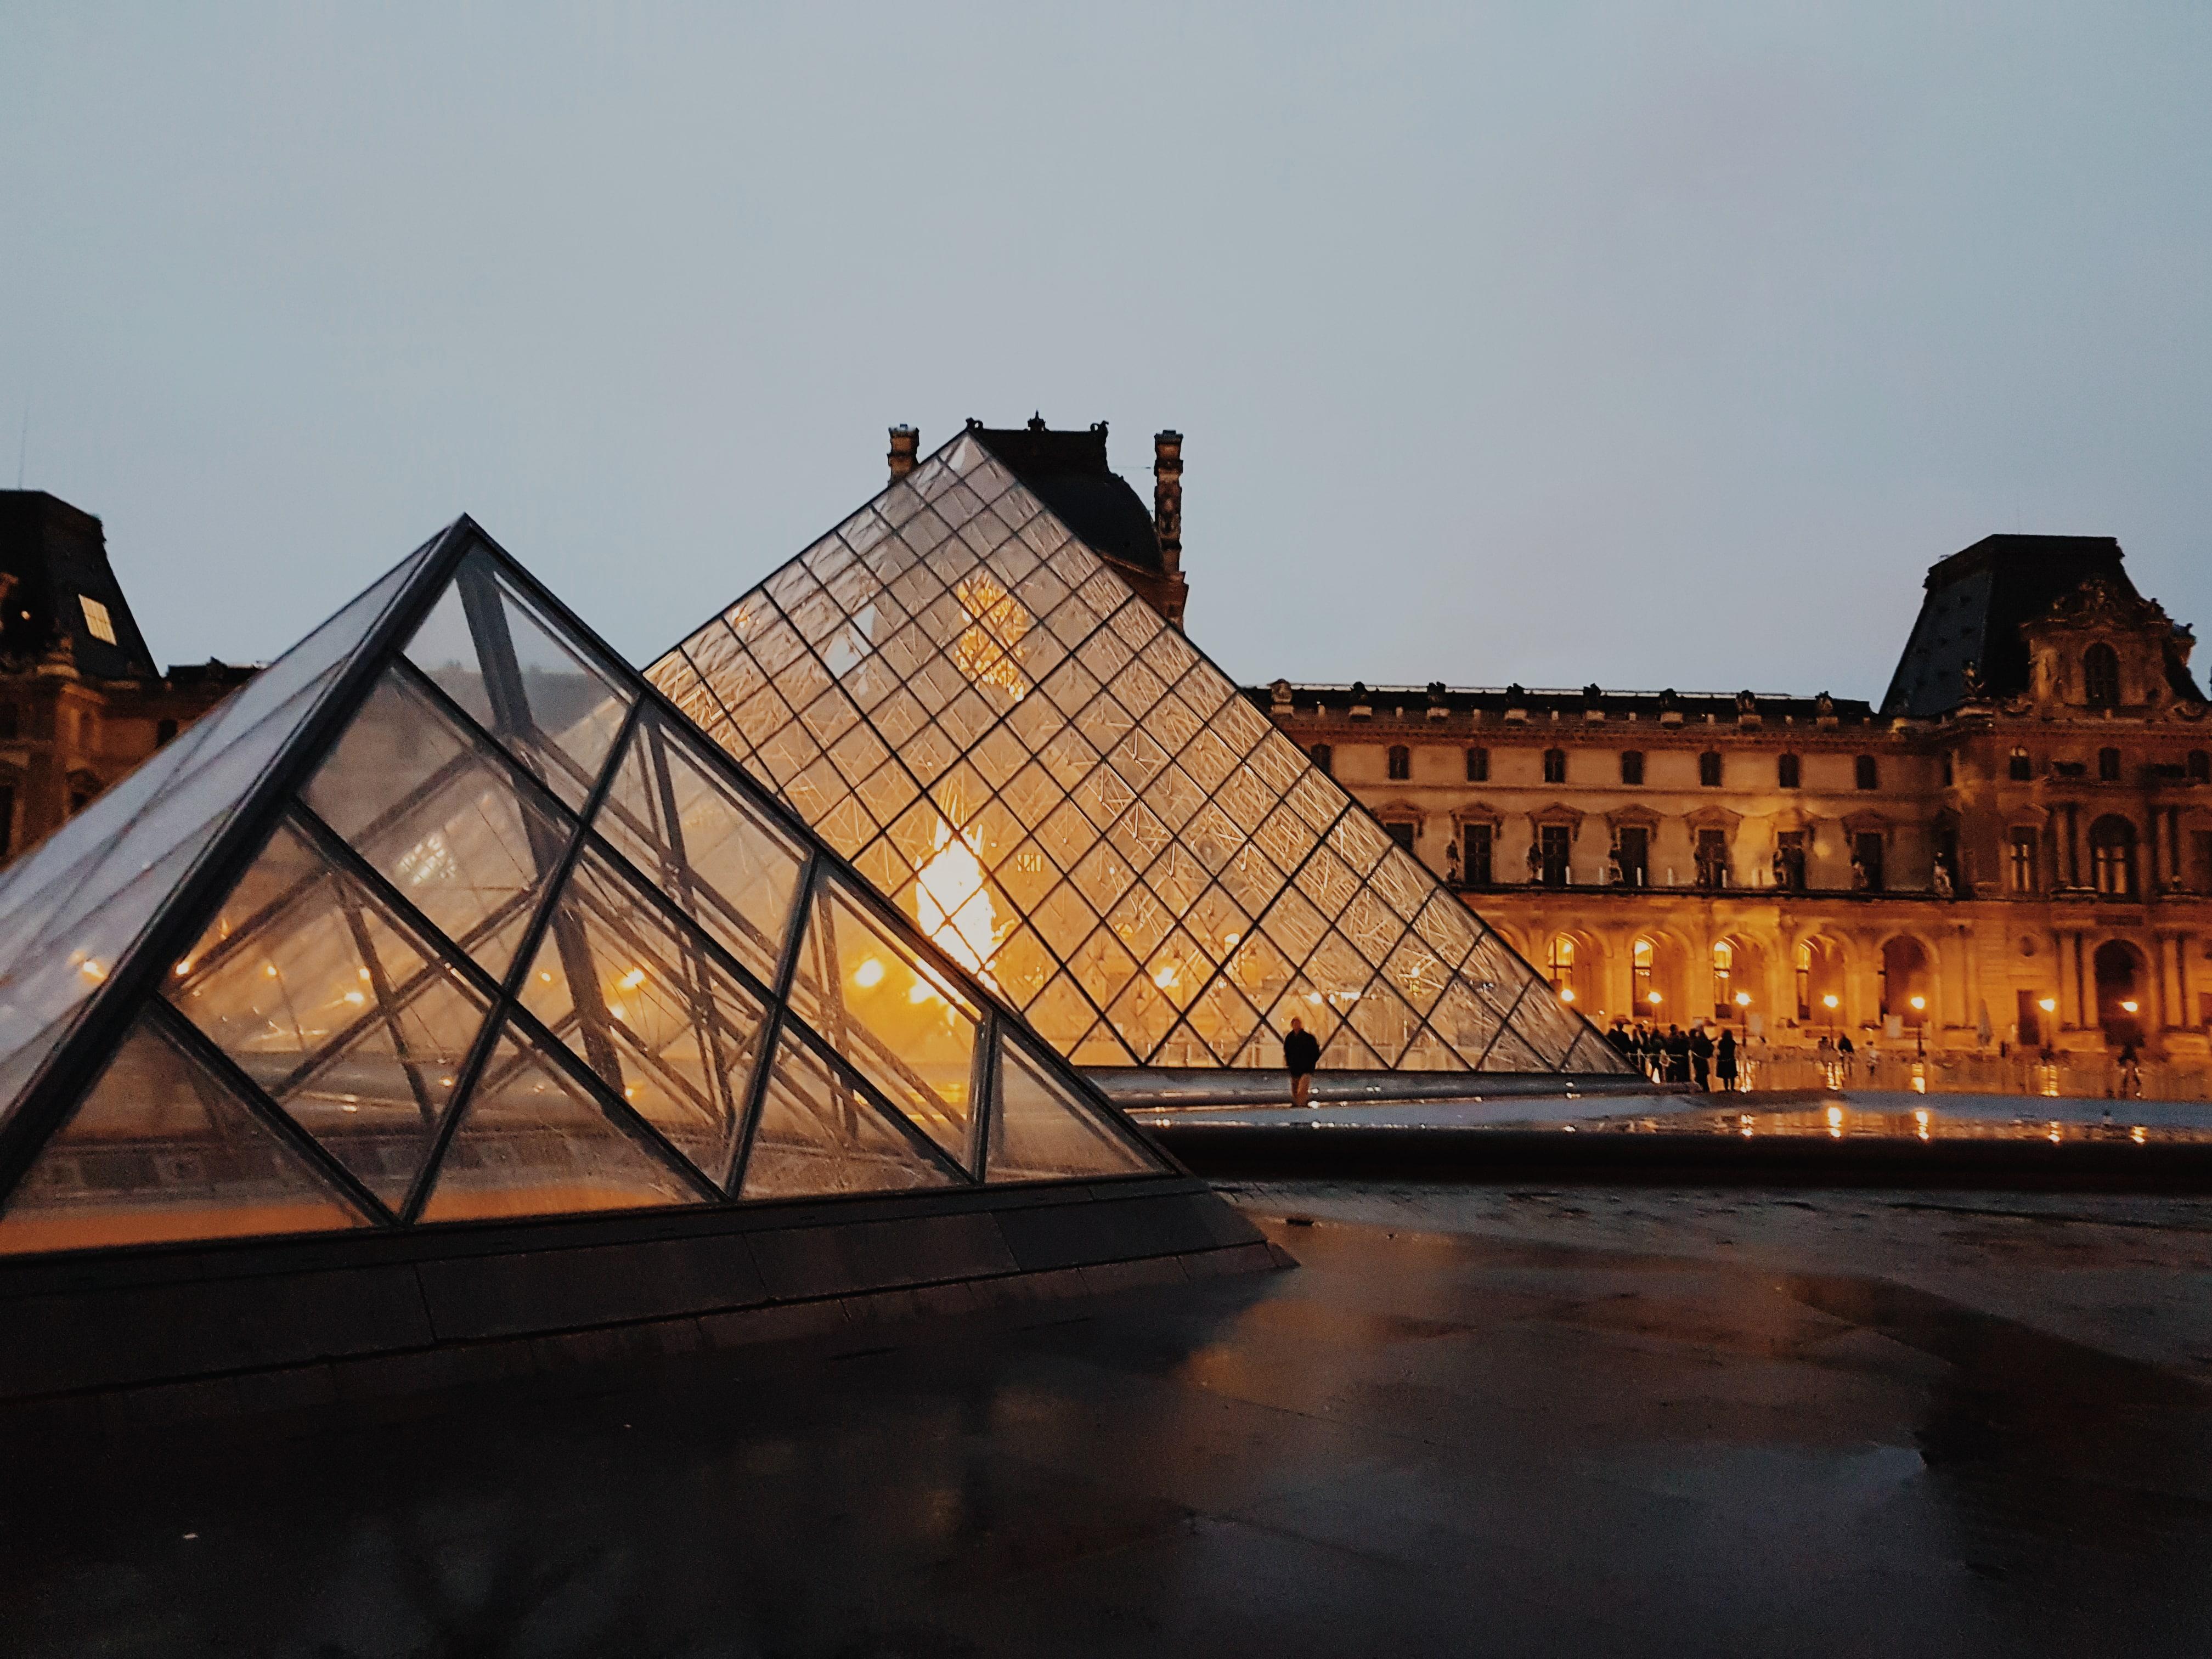 Parigi low cost: consigli su come risparmiare a Parigi